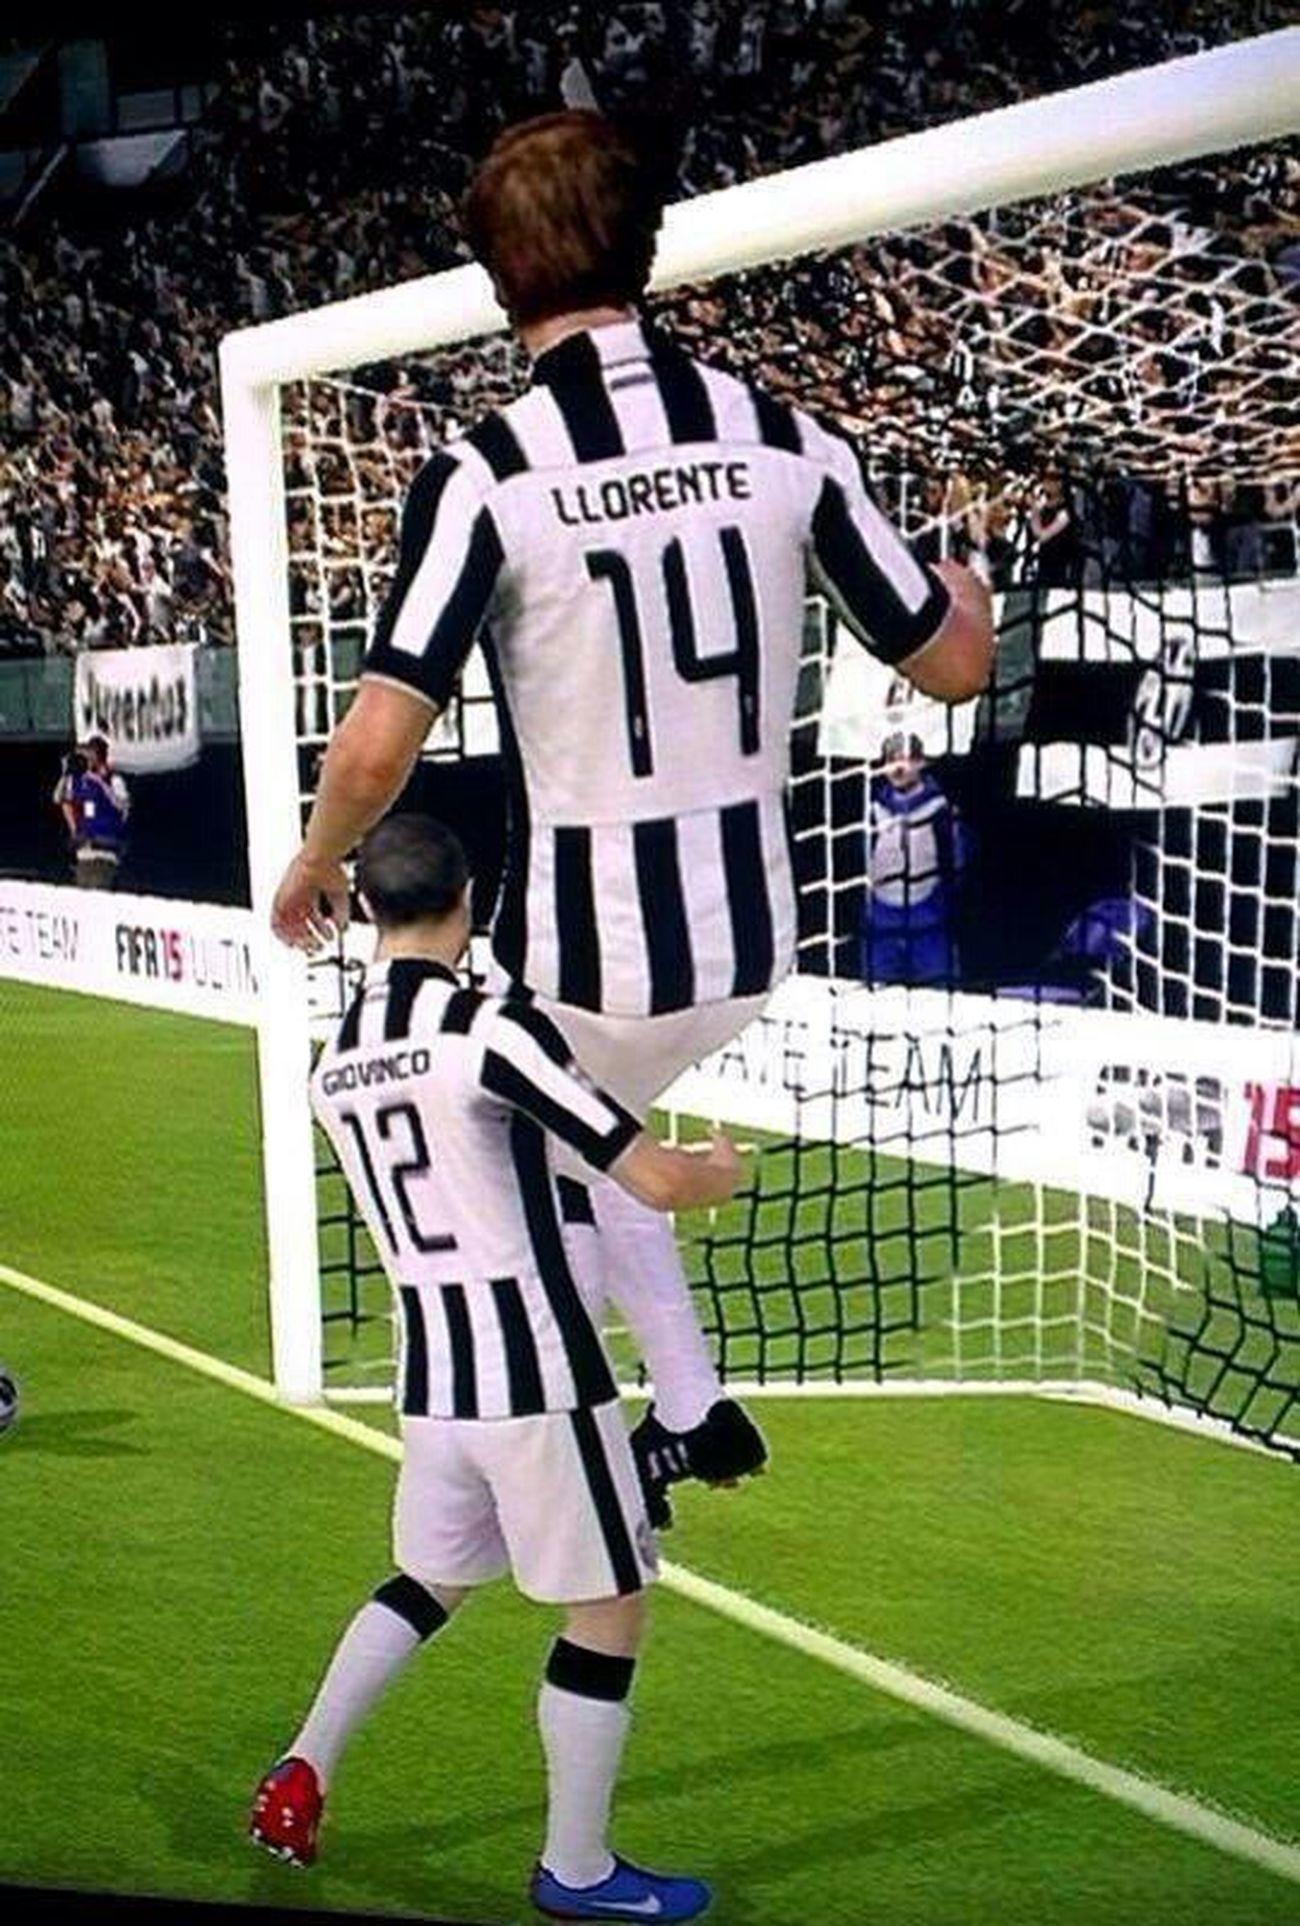 FİFA15 aşırı gerçekçi Fifa EA Sports Fıfa World Cup Brasil Fifa15 Sims4 Juventus Giovinco Hi! Taking Photos That's Me